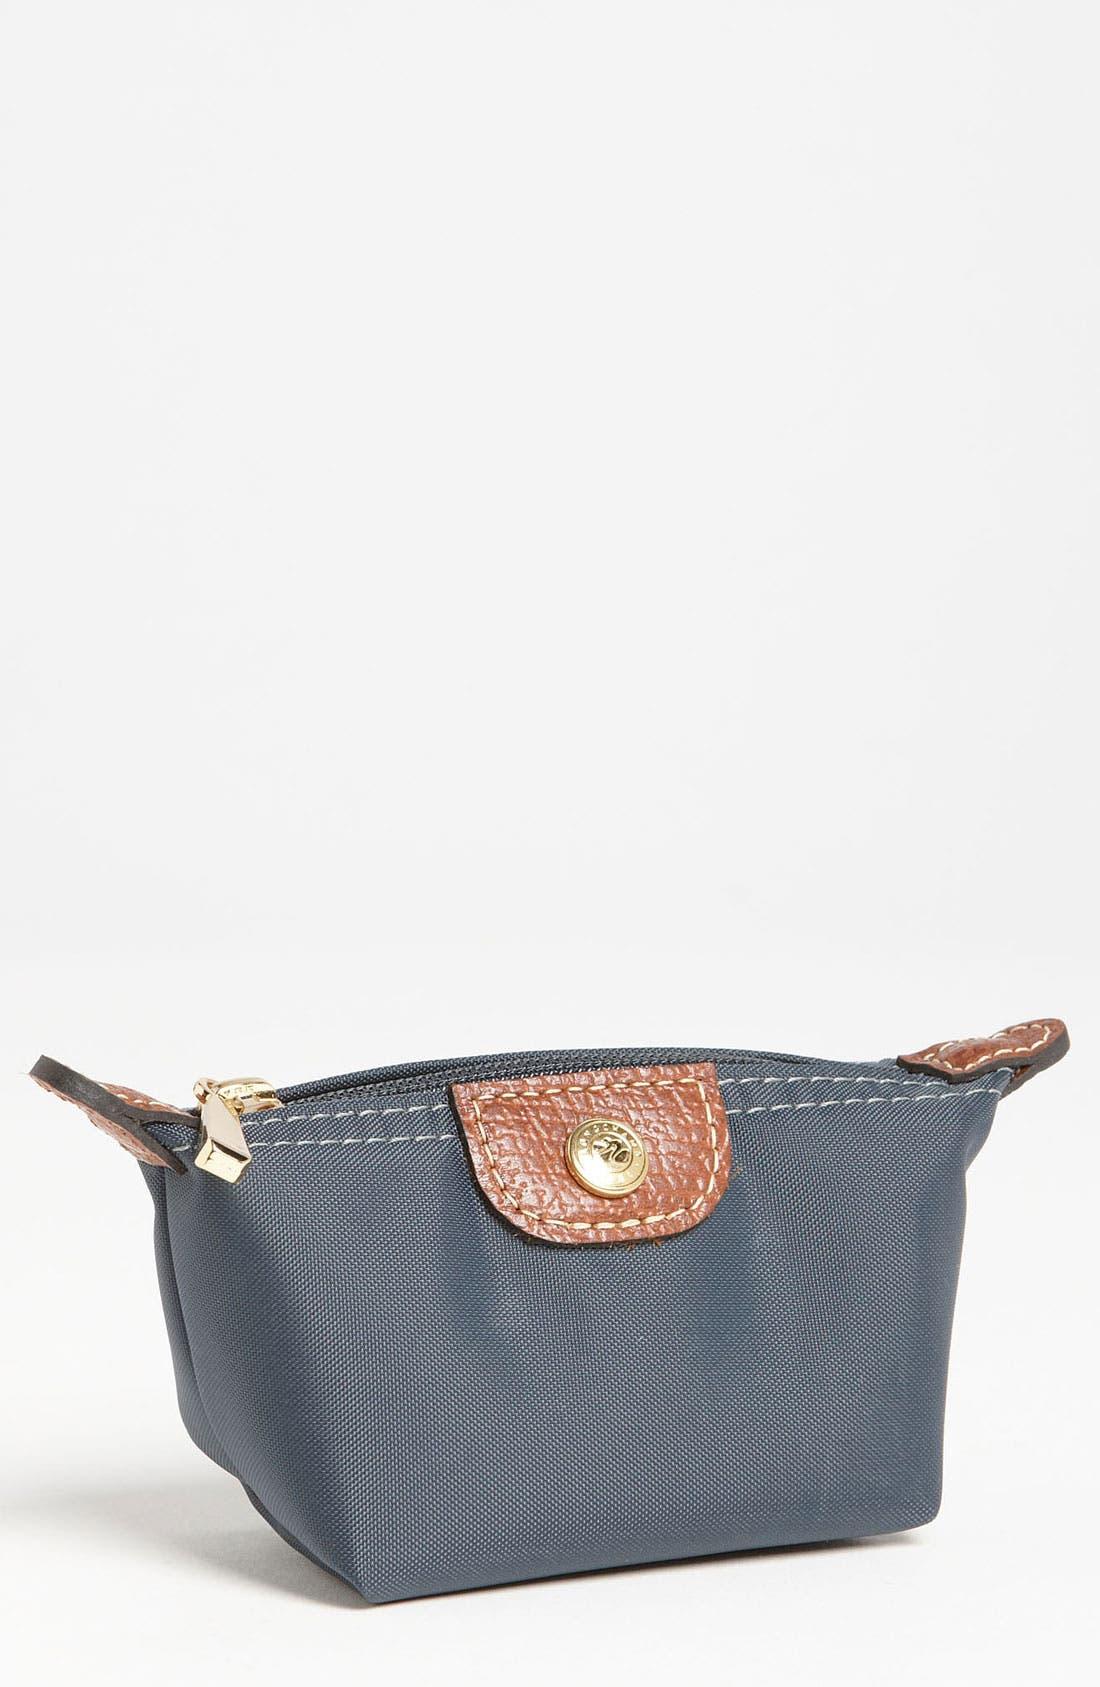 Alternate Image 1 Selected - Longchamp 'Le Pliage' Coin Pouch